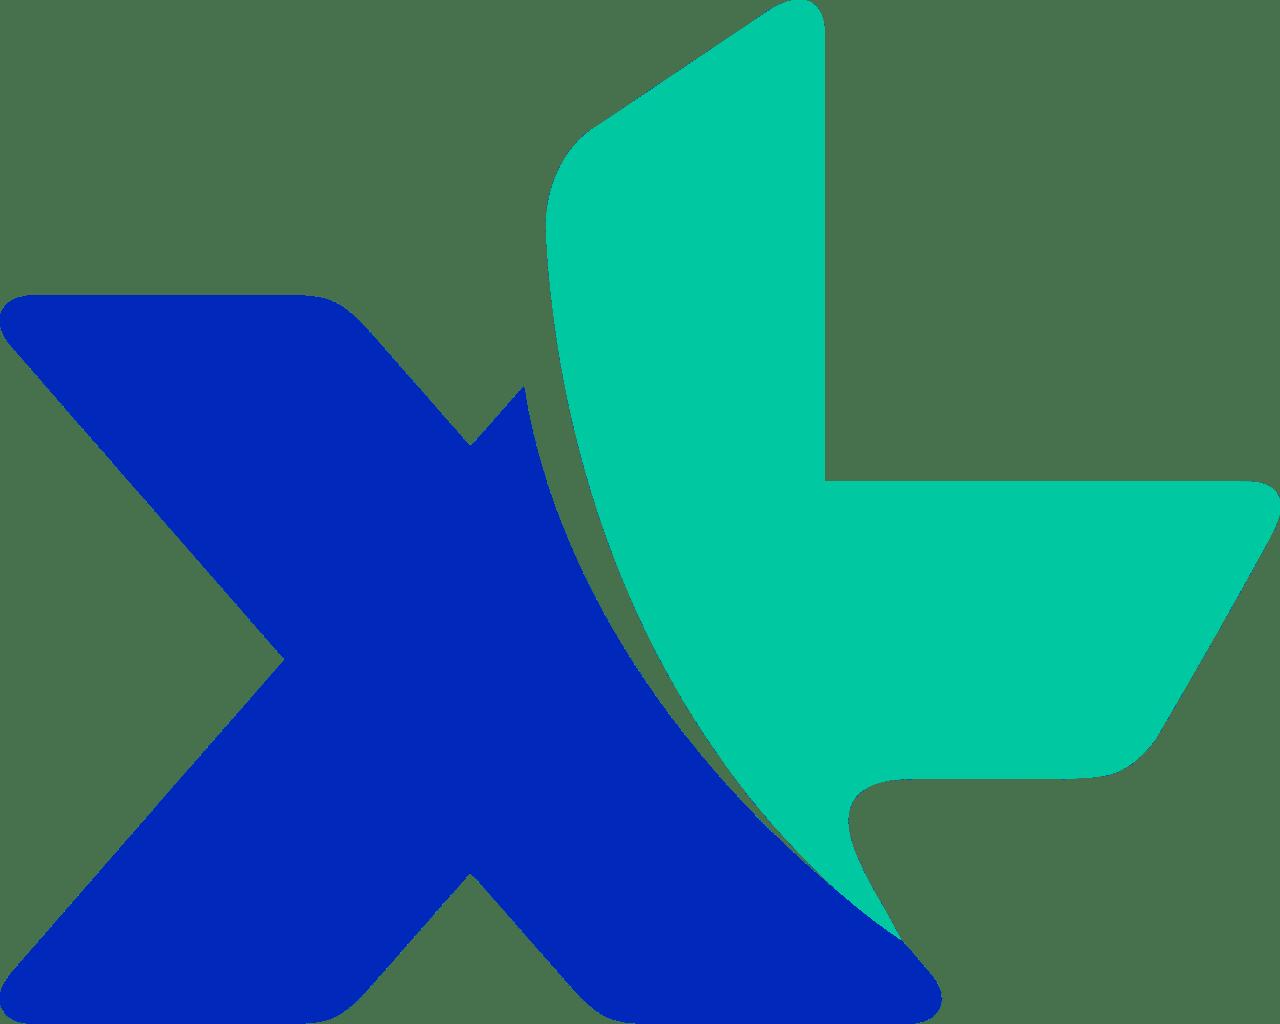 Logo XL Transparan